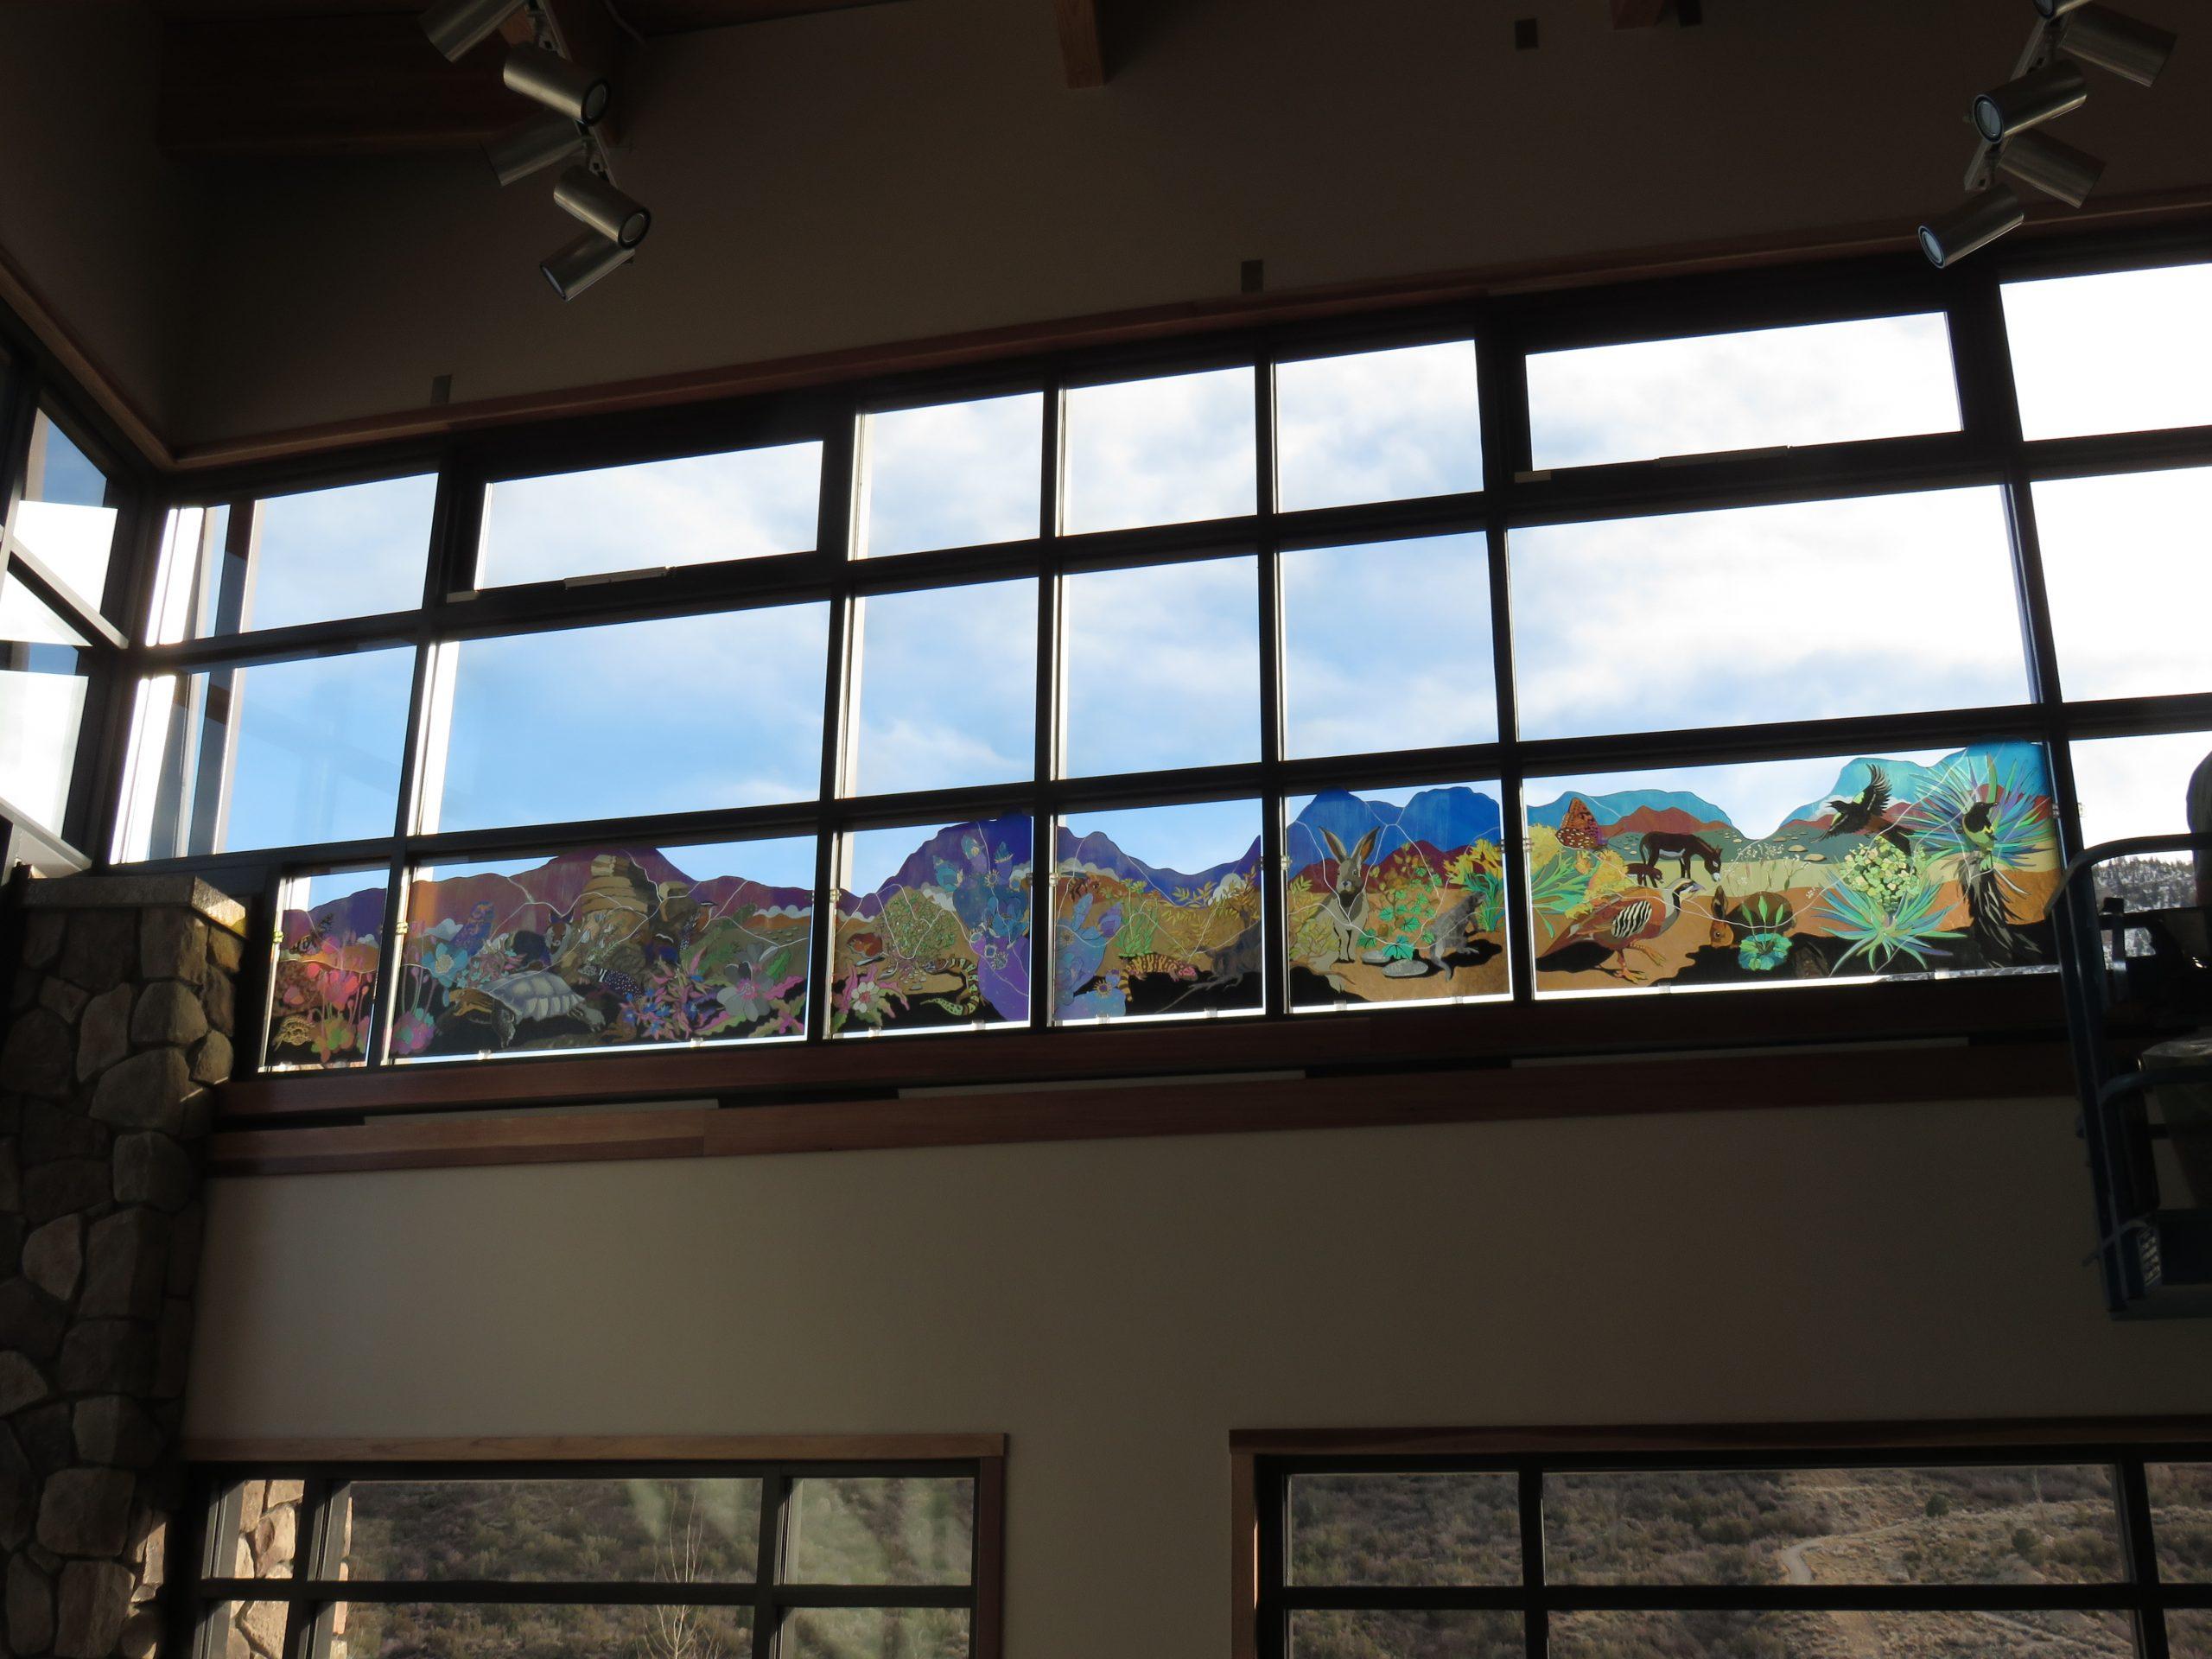 Spring Mountains Visitor Gateway Interactive Polarized Light Window Installation